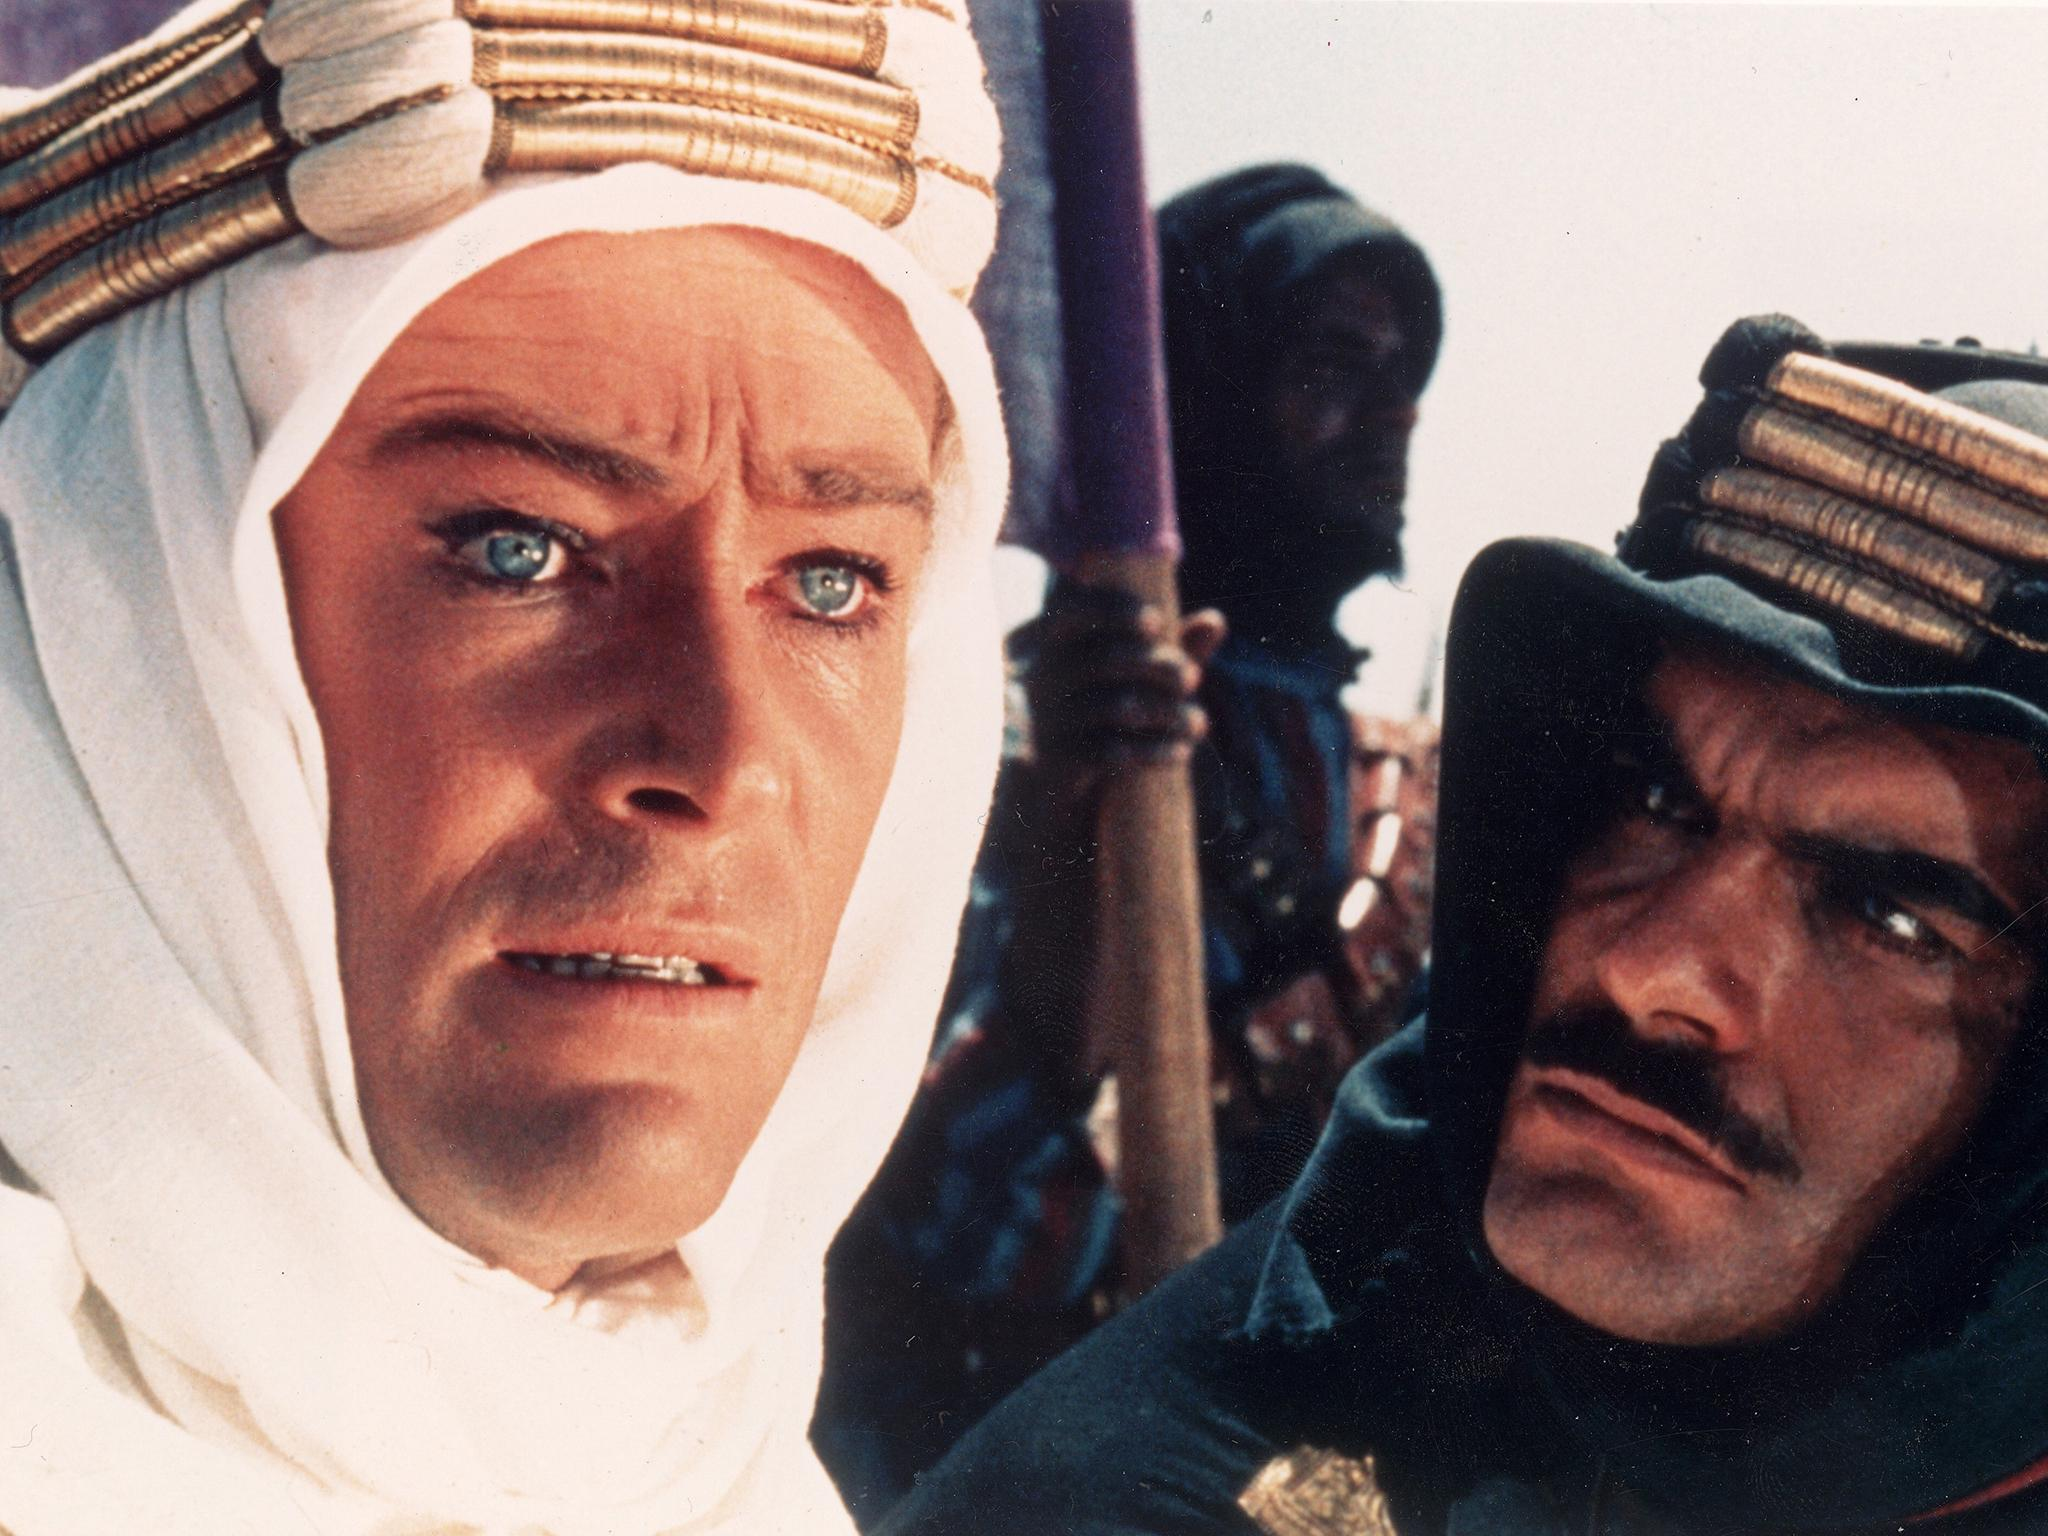 10. Lawrence of Arabia